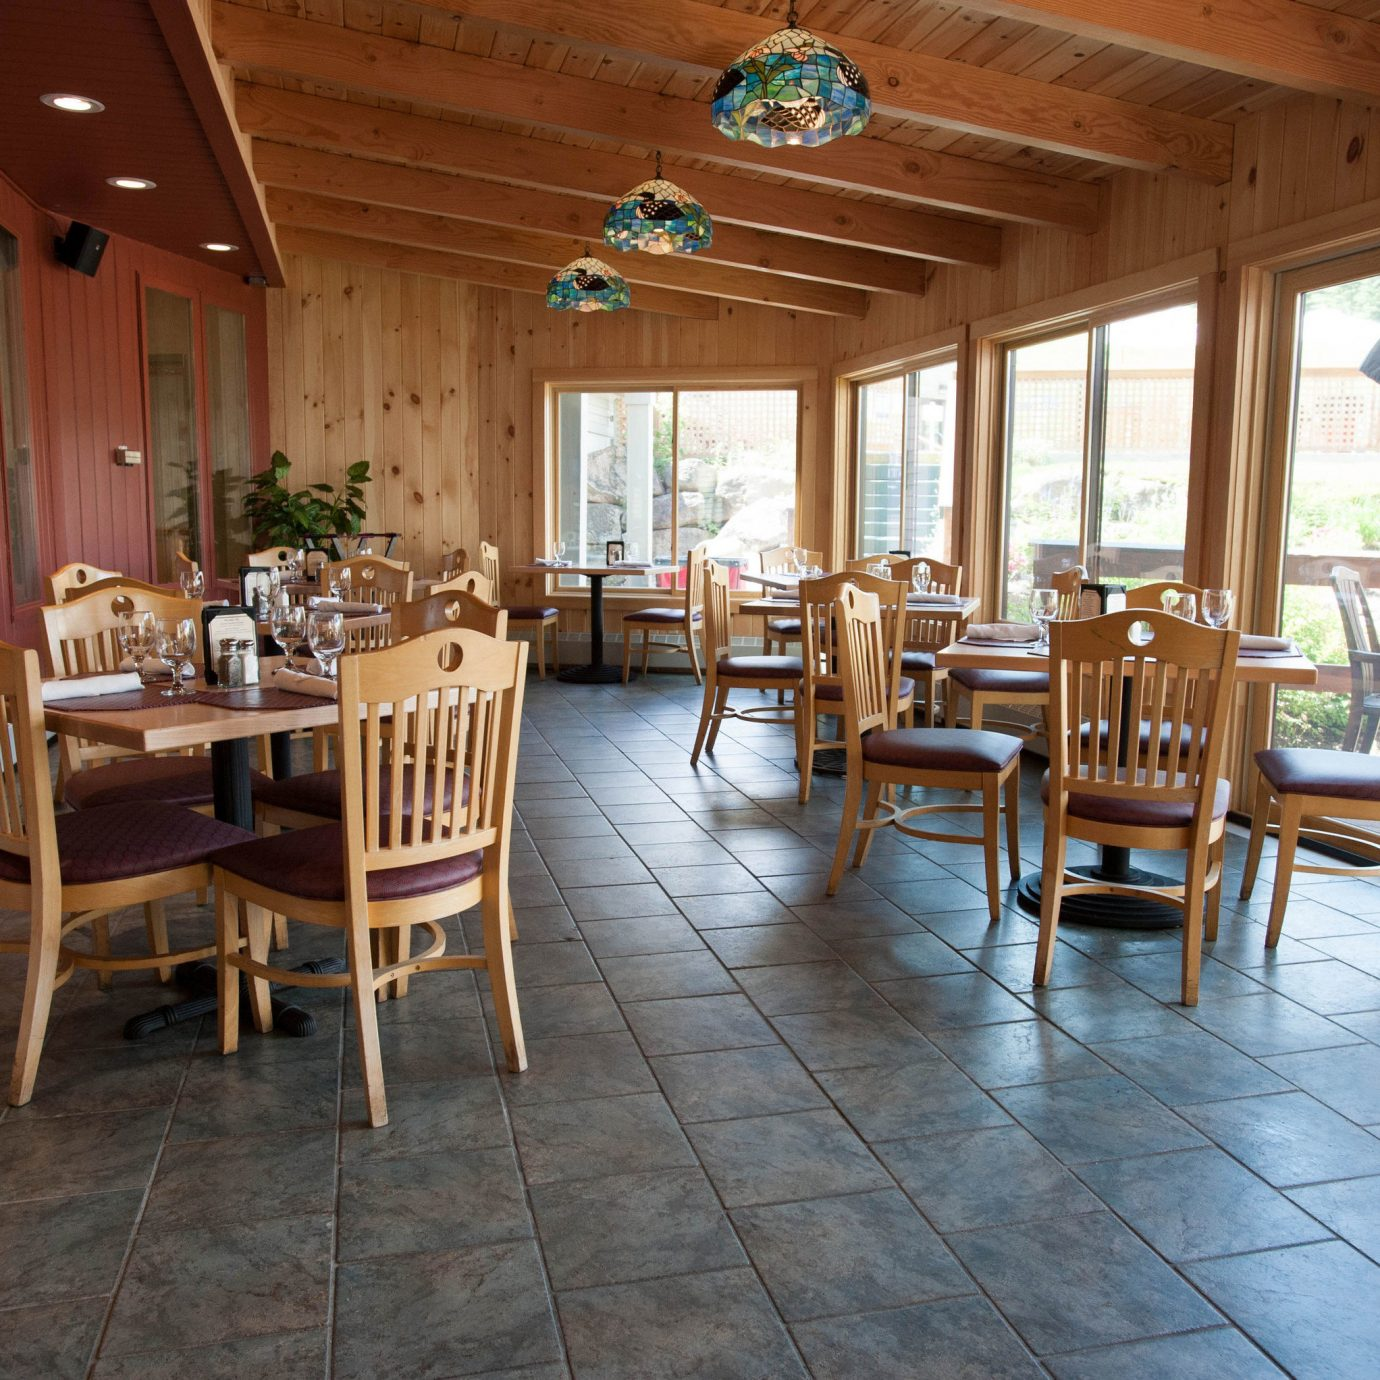 chair property building wooden Resort Dining restaurant cottage porch Villa